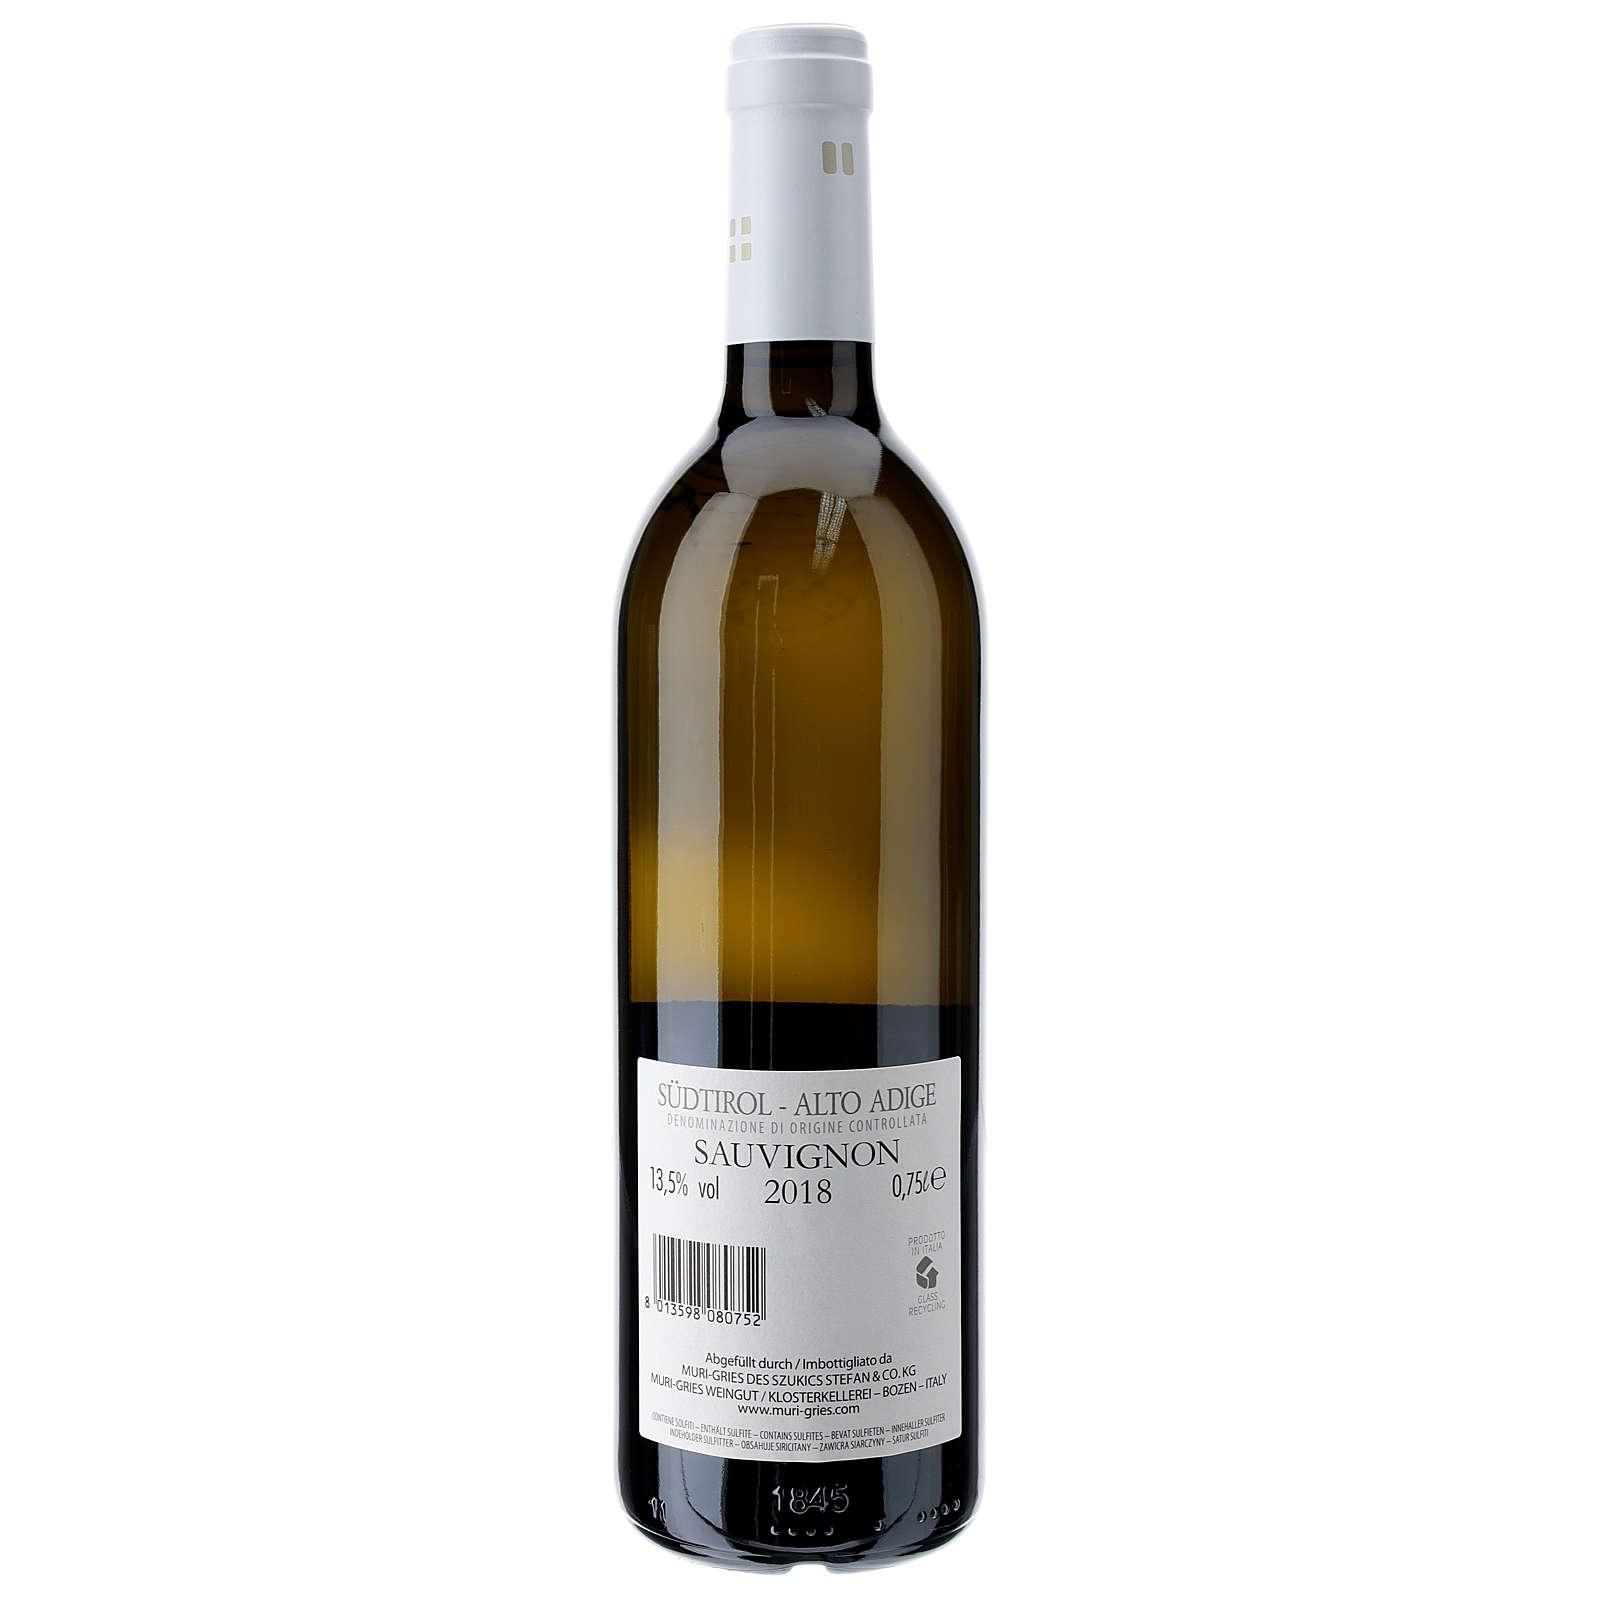 Vin Sauvignon 2018 Abbaye Muri Gries 750ml 3